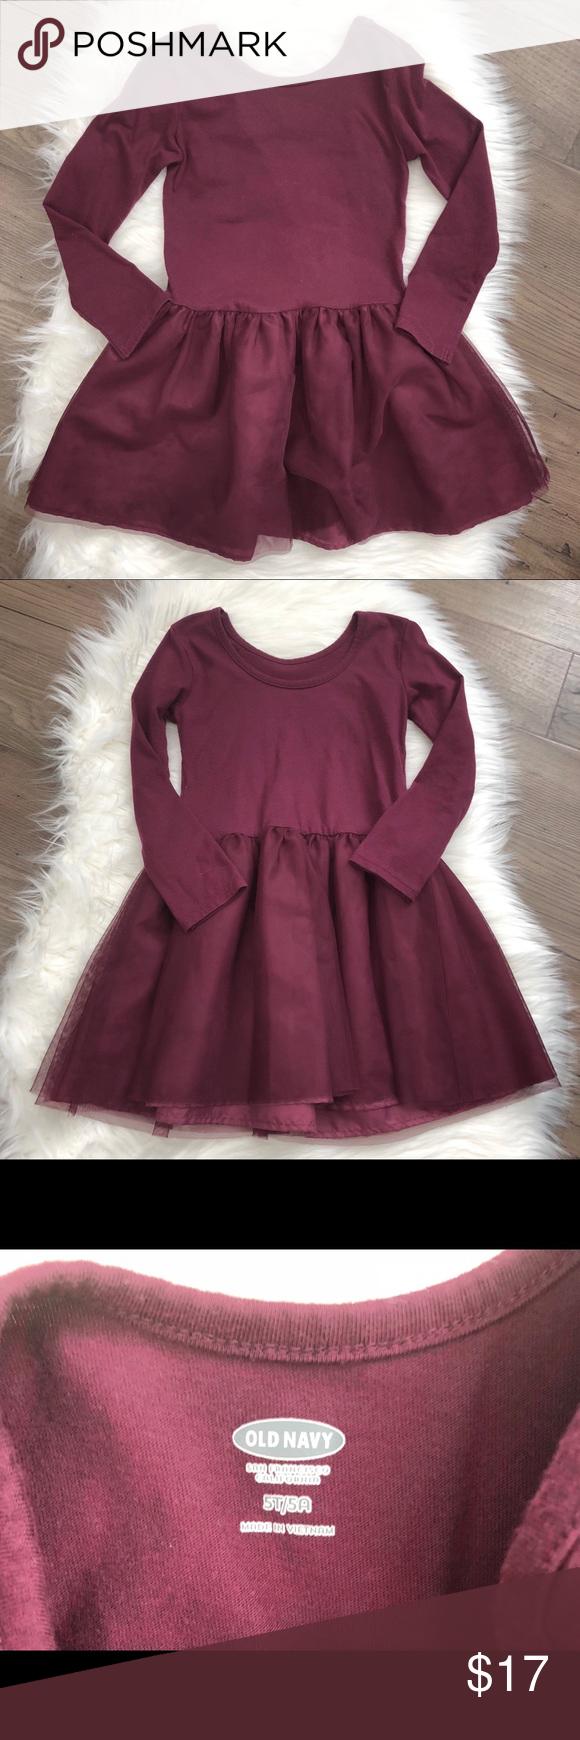 Old Navy Toddler Girls Burgundy Wine Tutu Dress 5t Old Navy Toddler Girl Dresses 5t Tutu Dress [ 1740 x 580 Pixel ]